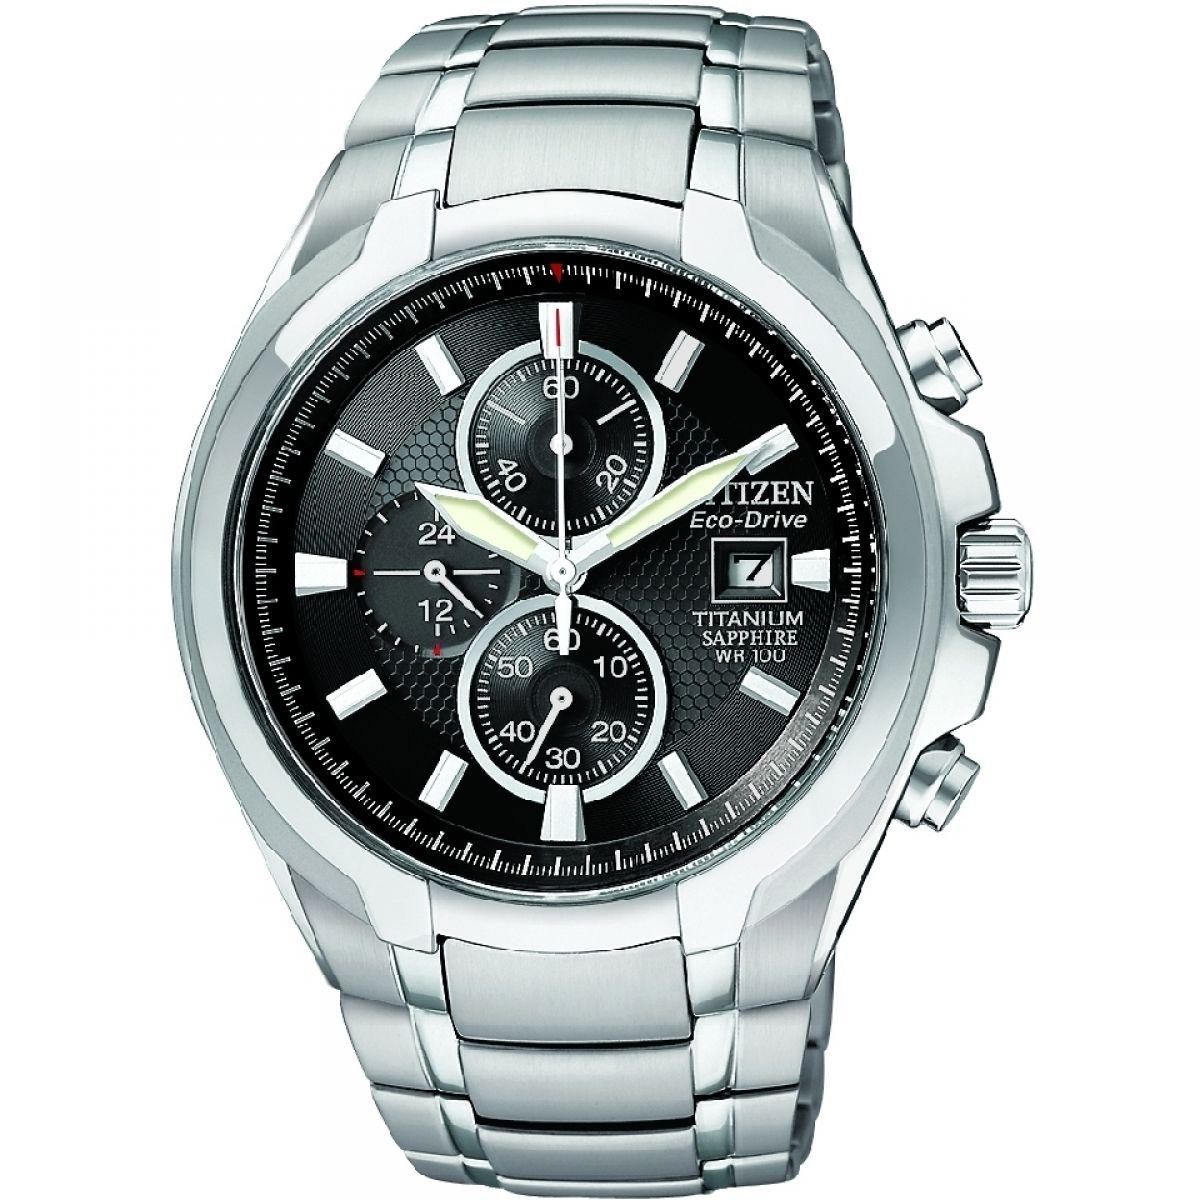 Gents Citizen Chronograph Watch (CA0260-52E) | WatchShop.com™